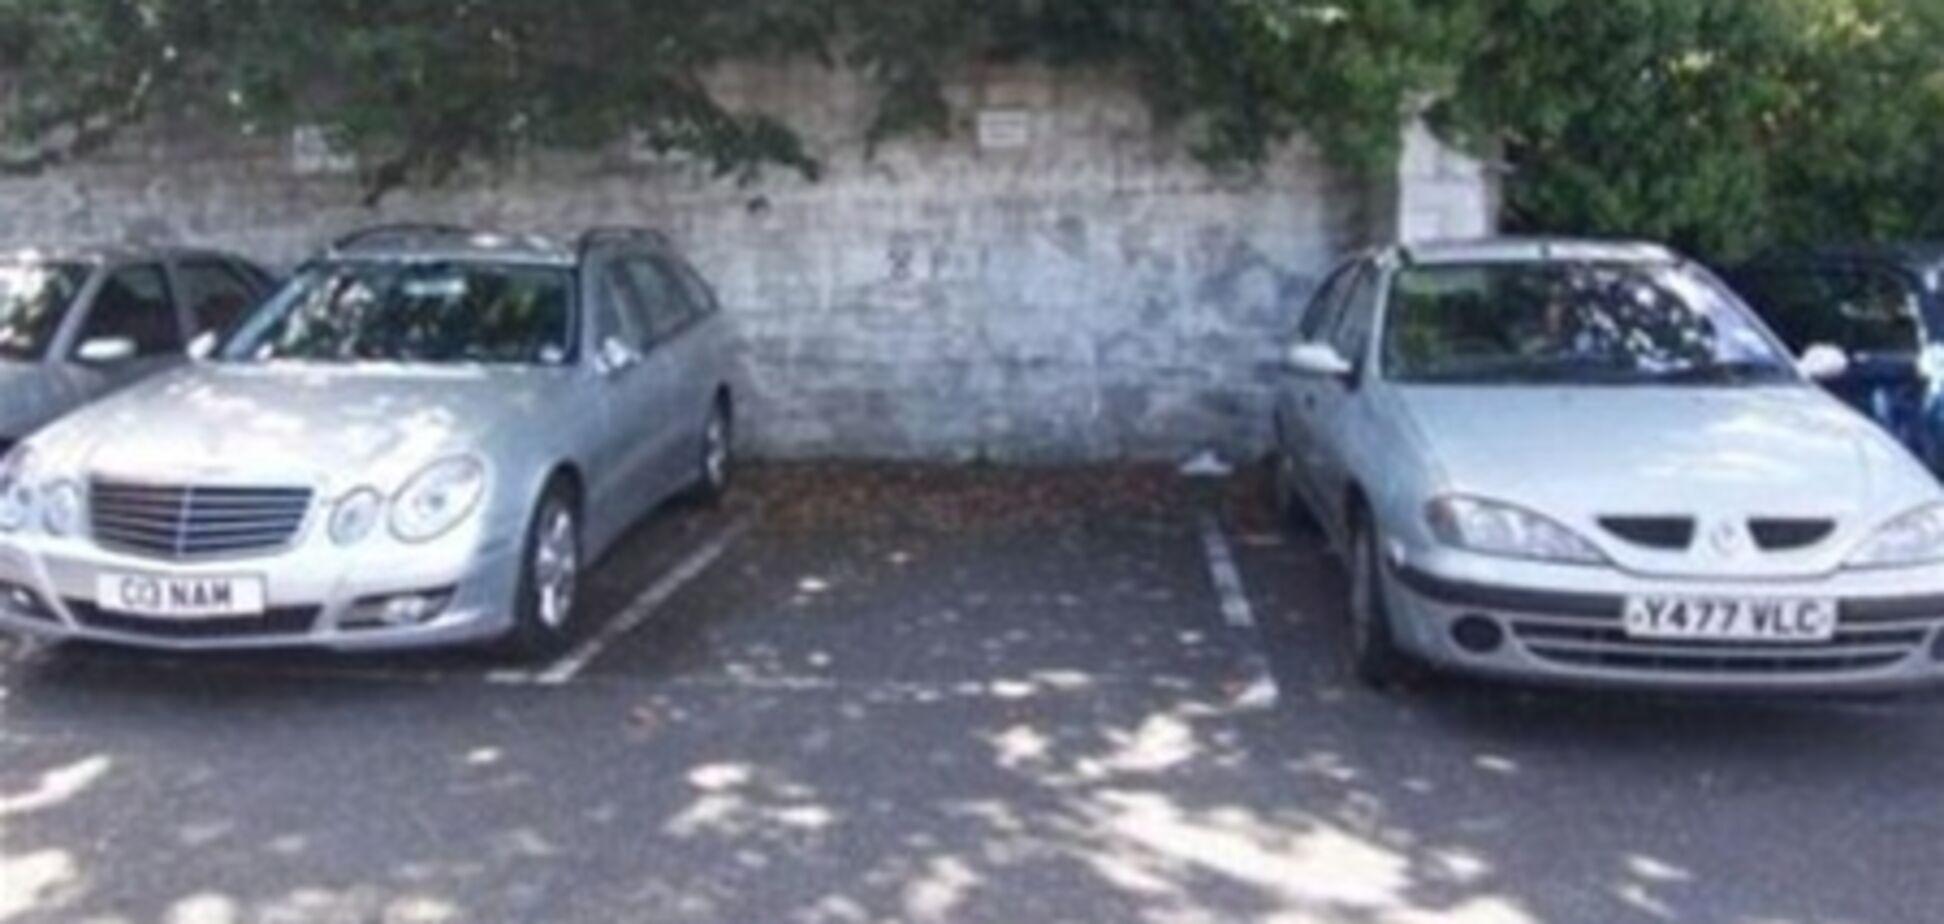 Цена парковочного места в Британии достигла 70 000 евро